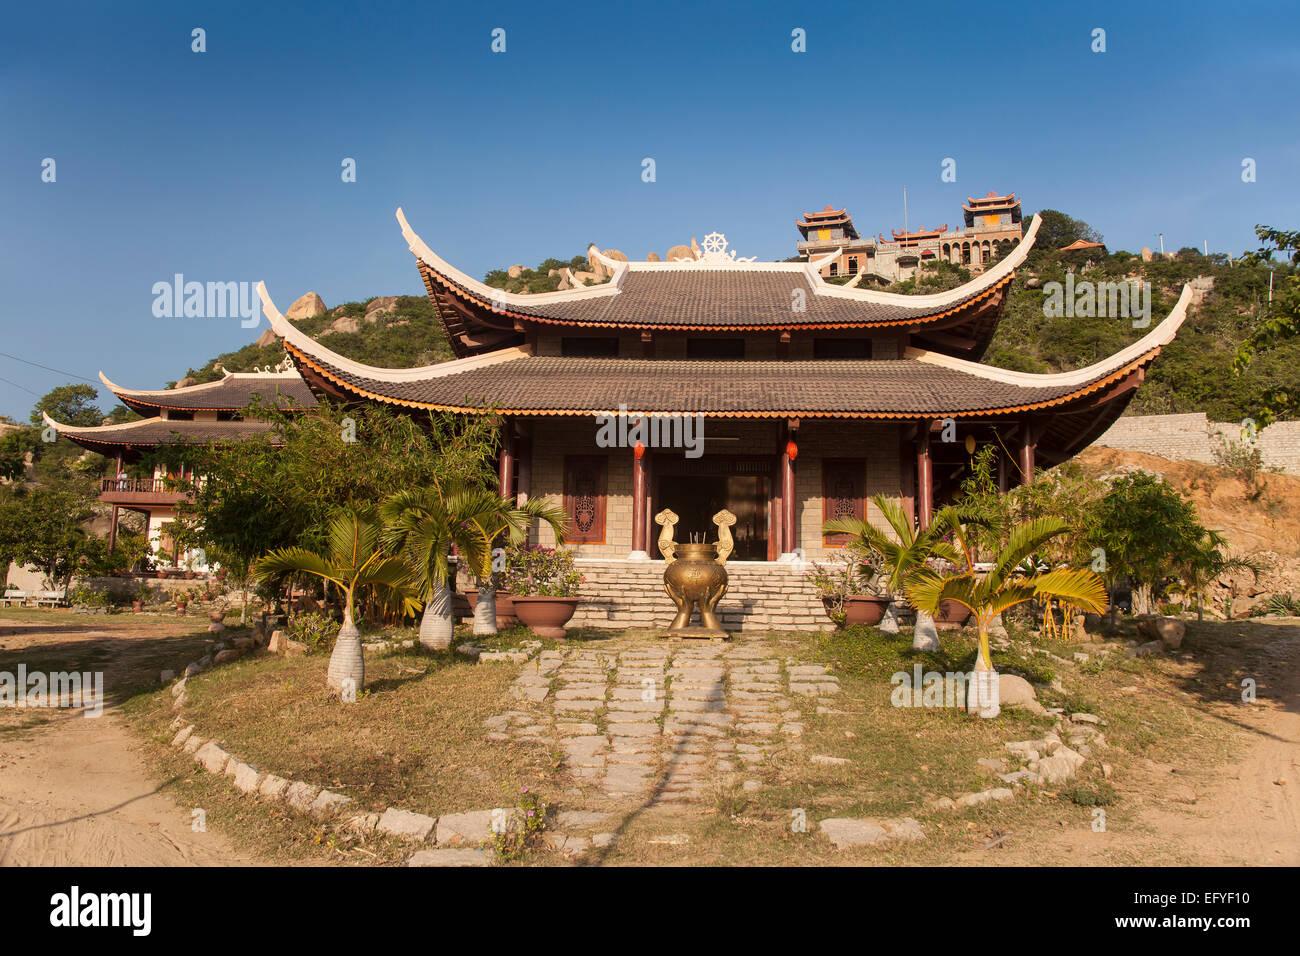 Thien Vien Truc Lam Pagoda, Phan Rang, Ninh Thuan, Vietnam - Stock Image